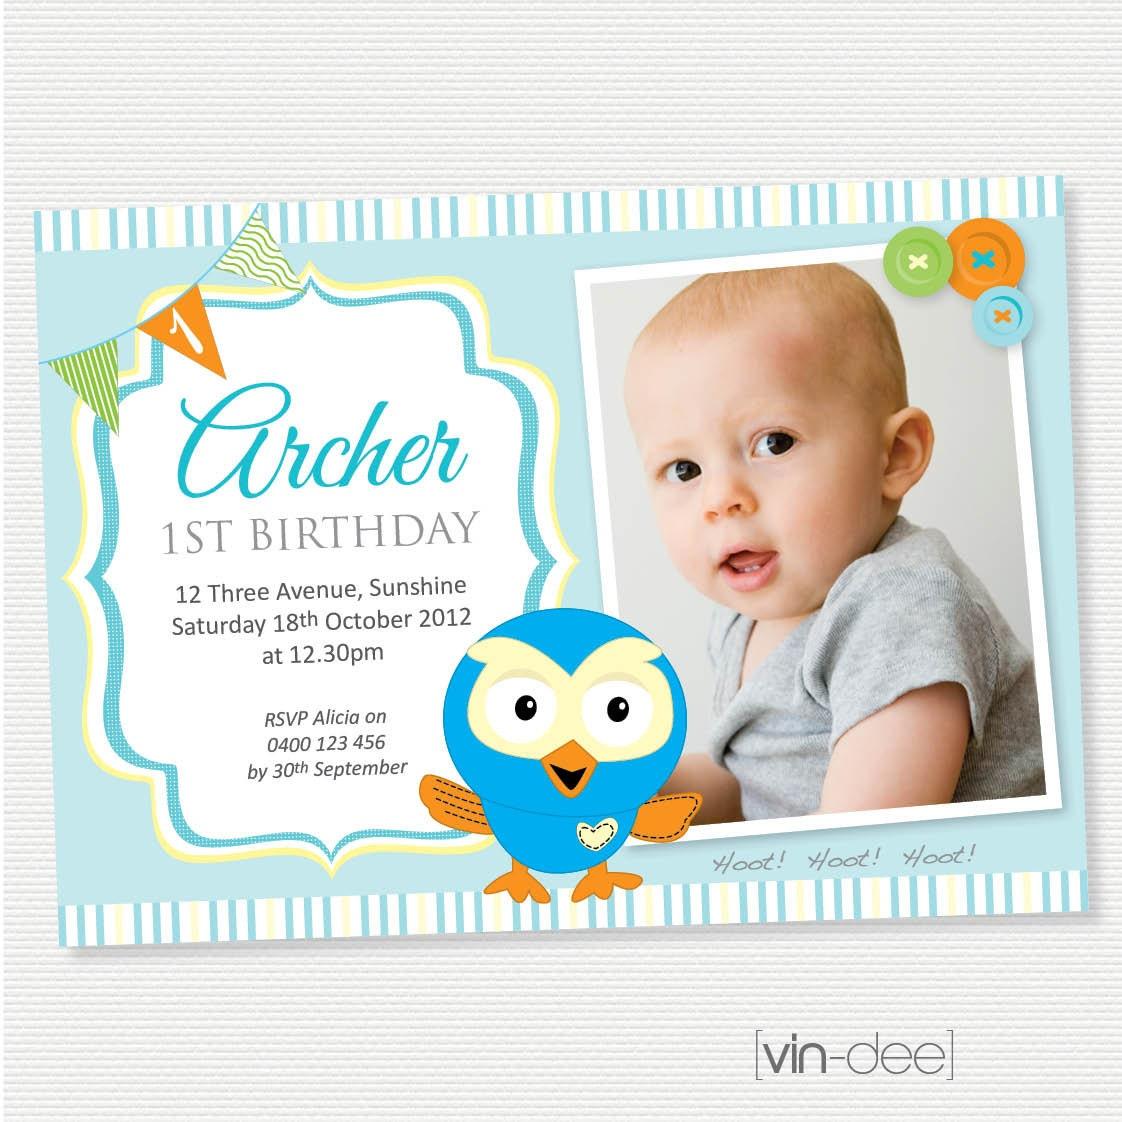 Airplane Birthday Invitation Diy Printable By Vindee On Etsy: Hoot The Owl Birthday Invitation With Photo DIY By Vindee